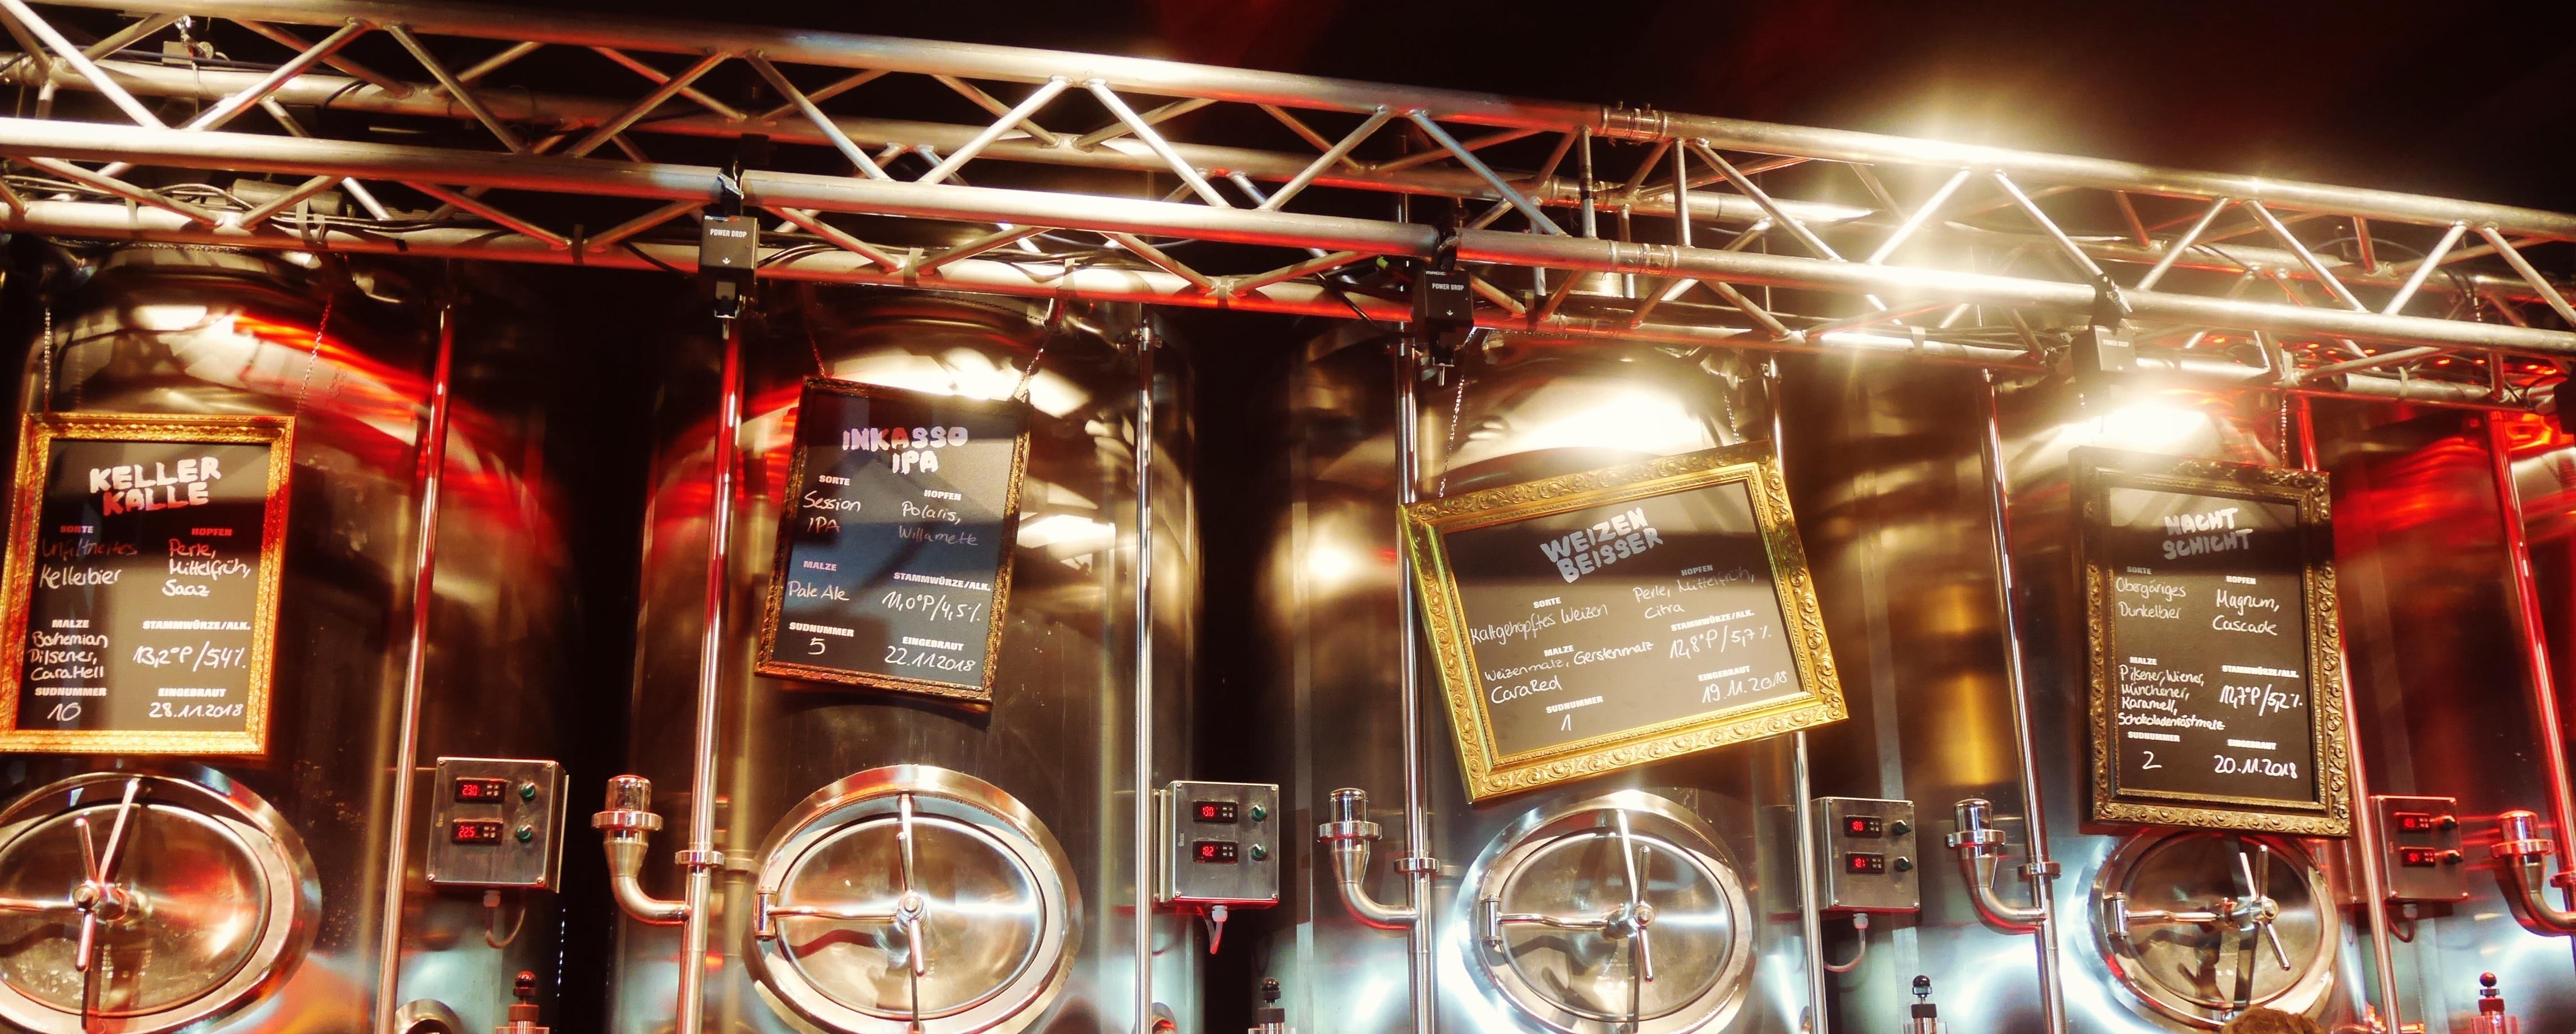 Astra-Brauerei-Tanks hinter der Theke